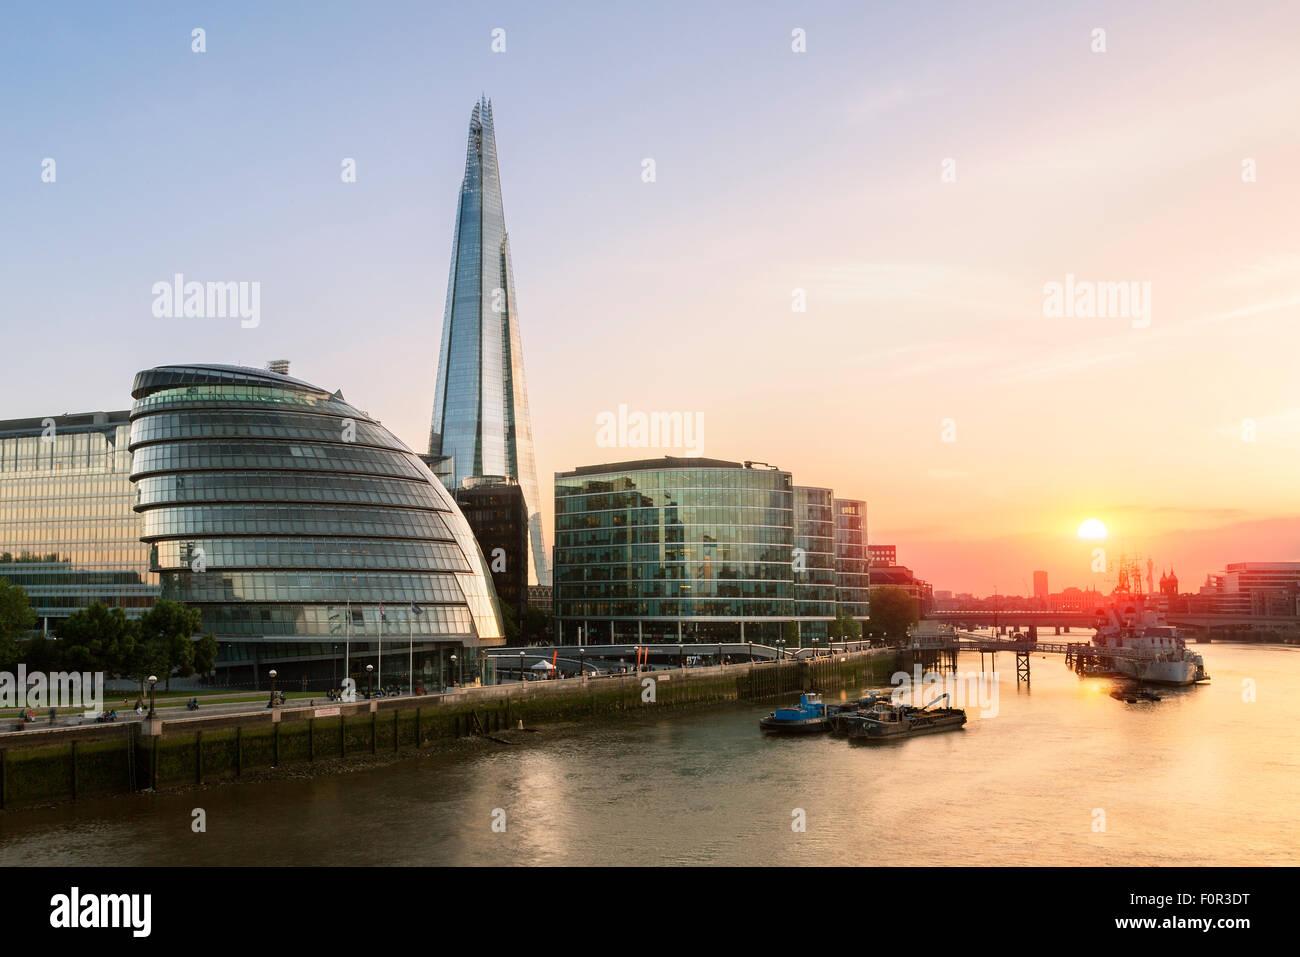 Londra, Shard London Bridge e il London City Hall al tramonto Immagini Stock